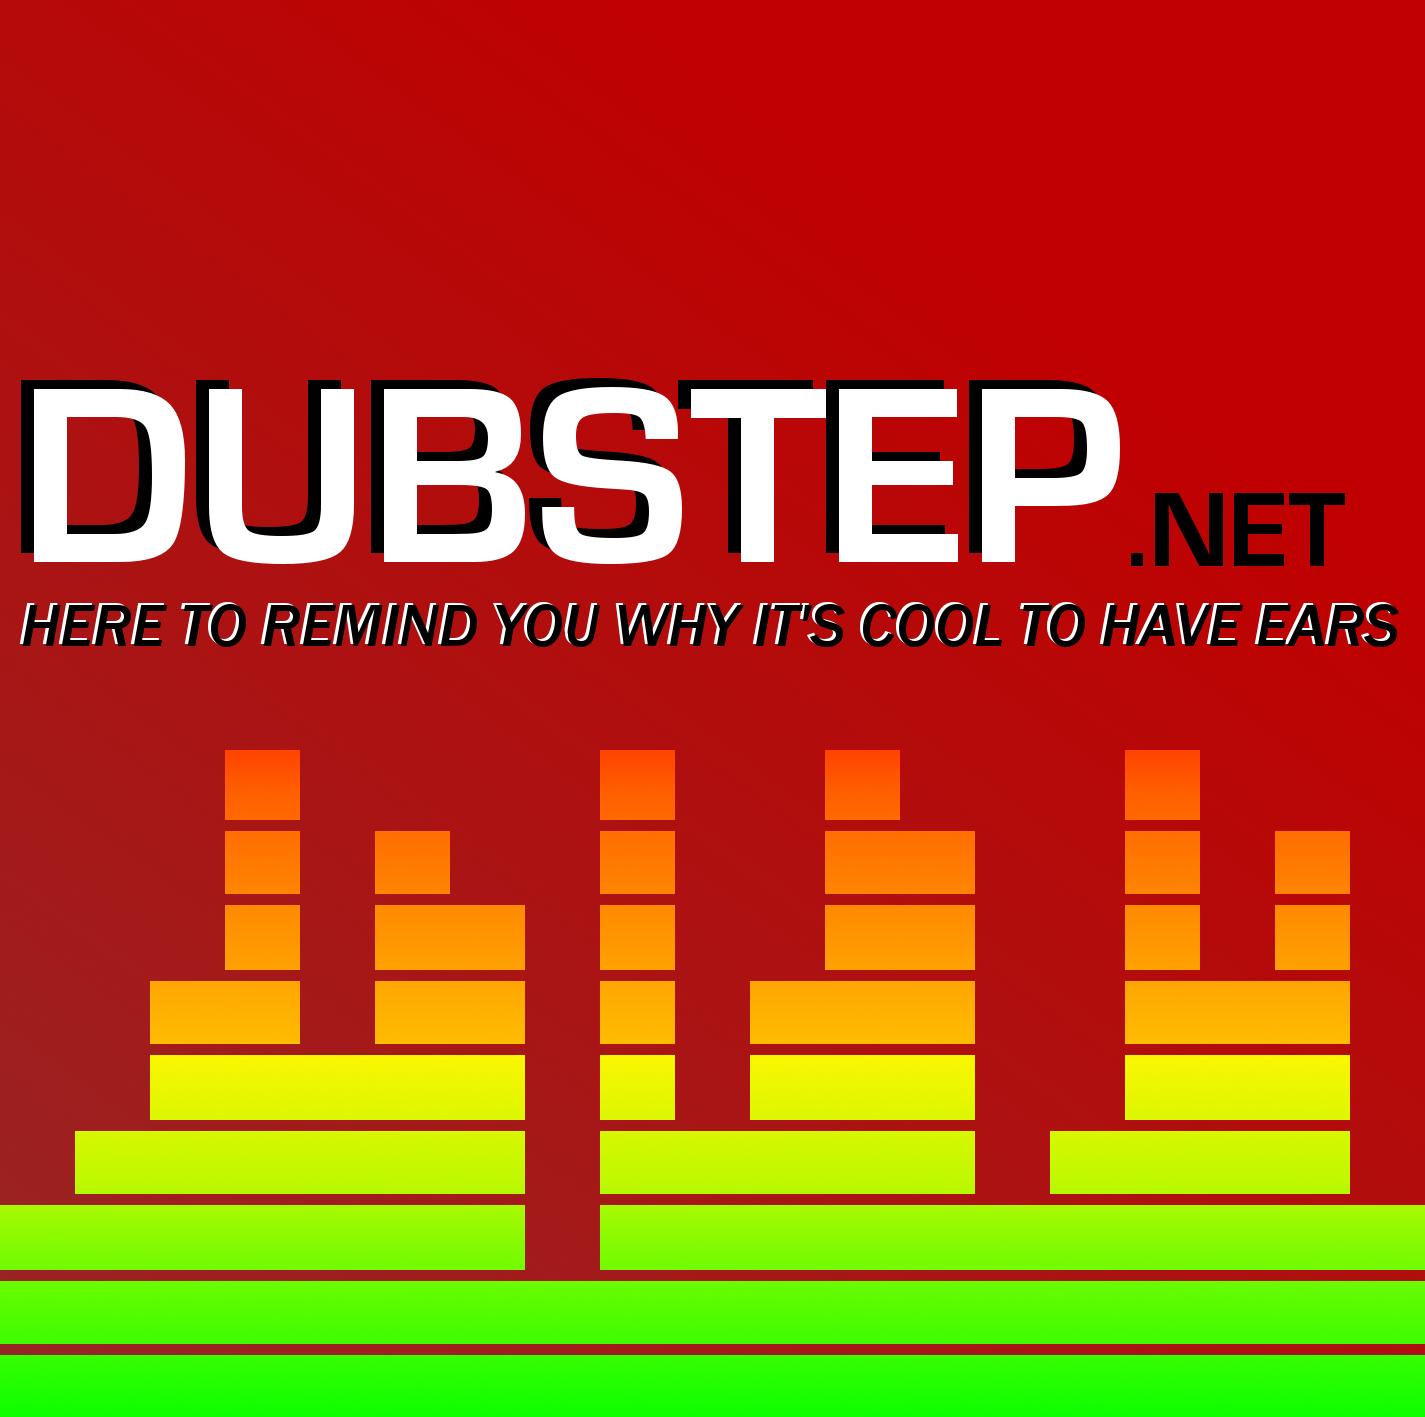 Dubstep.net Custom Album Cover by Xeozus on DeviantArt